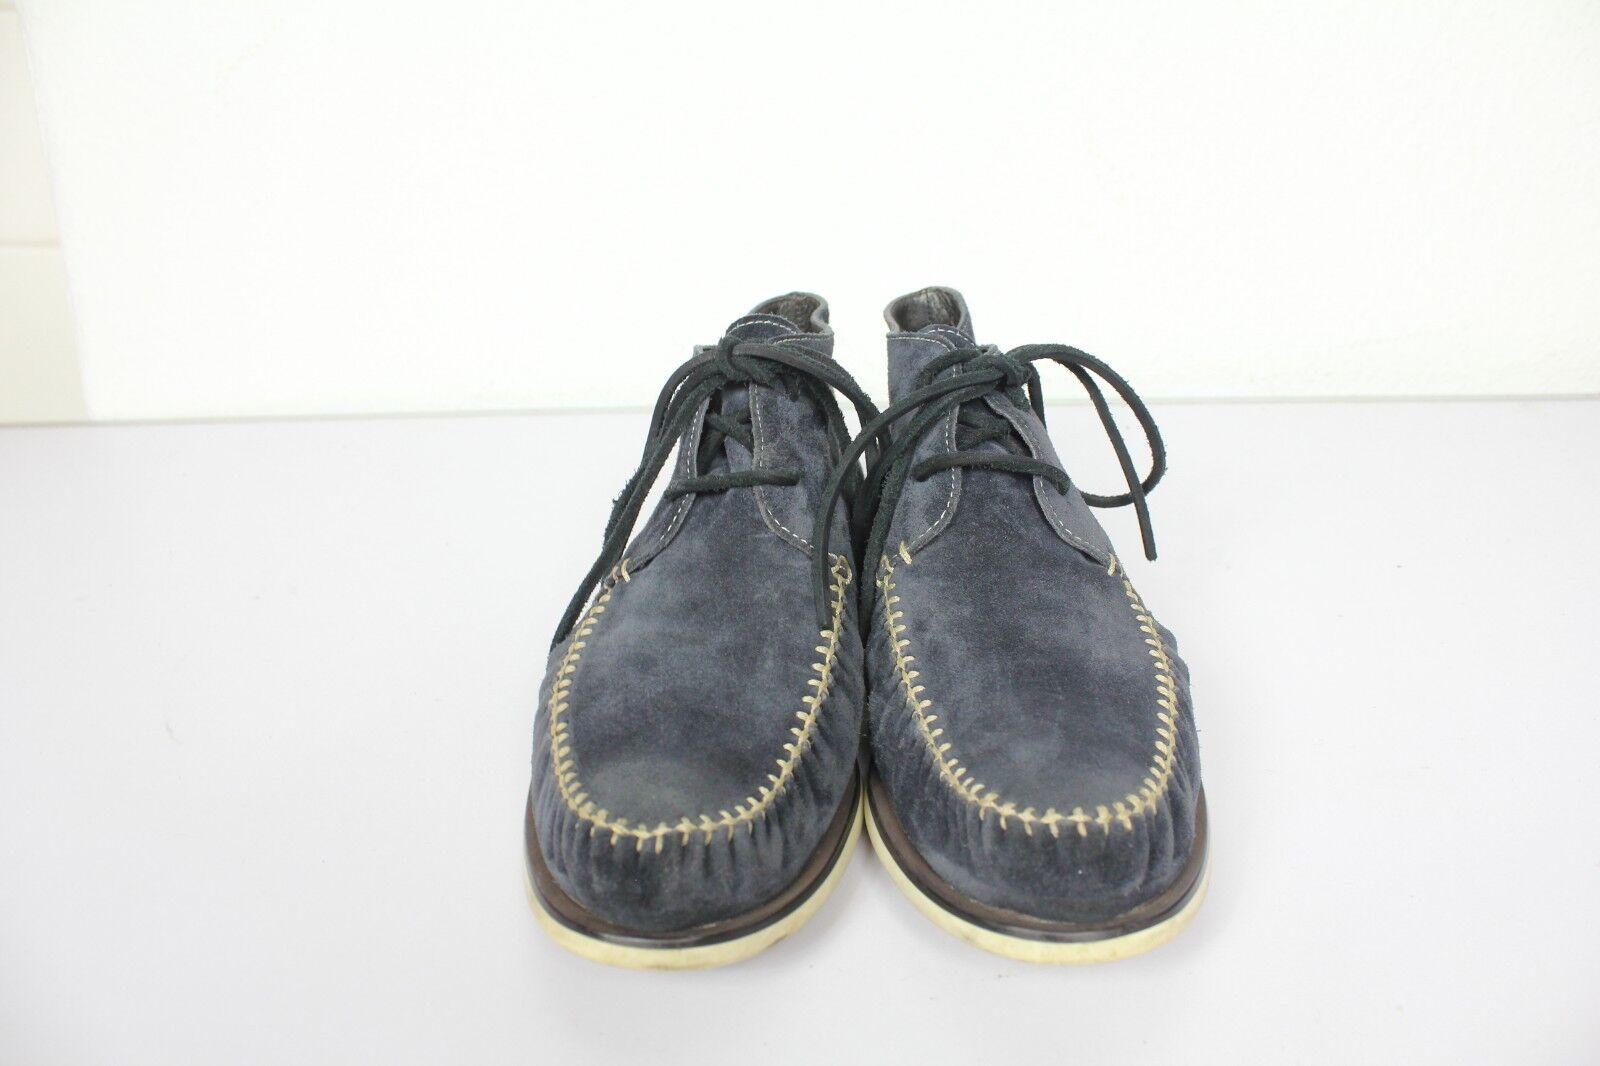 John Varvatos Usa elegante Chukka Boots nubukleder azul oscuro oscuro azul eu:44, 5-us:10 eaf9ad